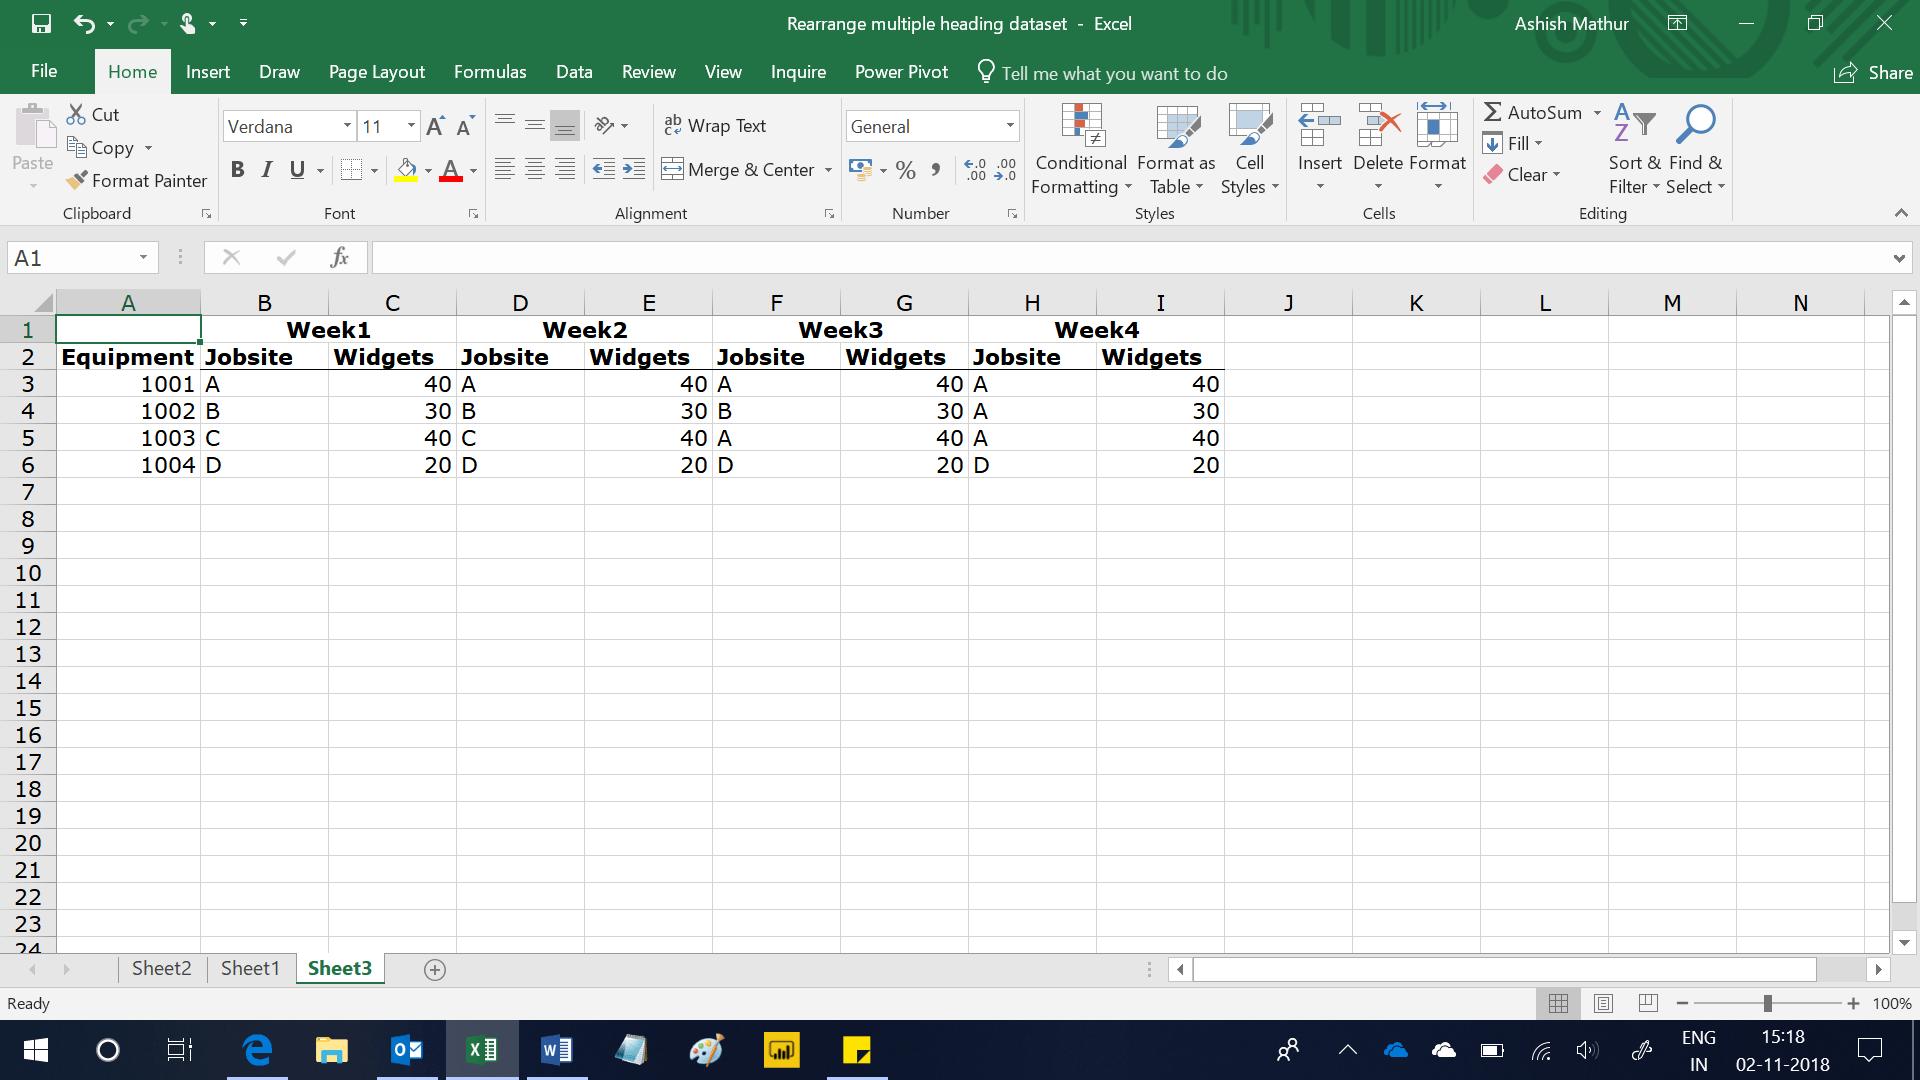 Rearrange A Multi Heading Dataset Into A Single Heading